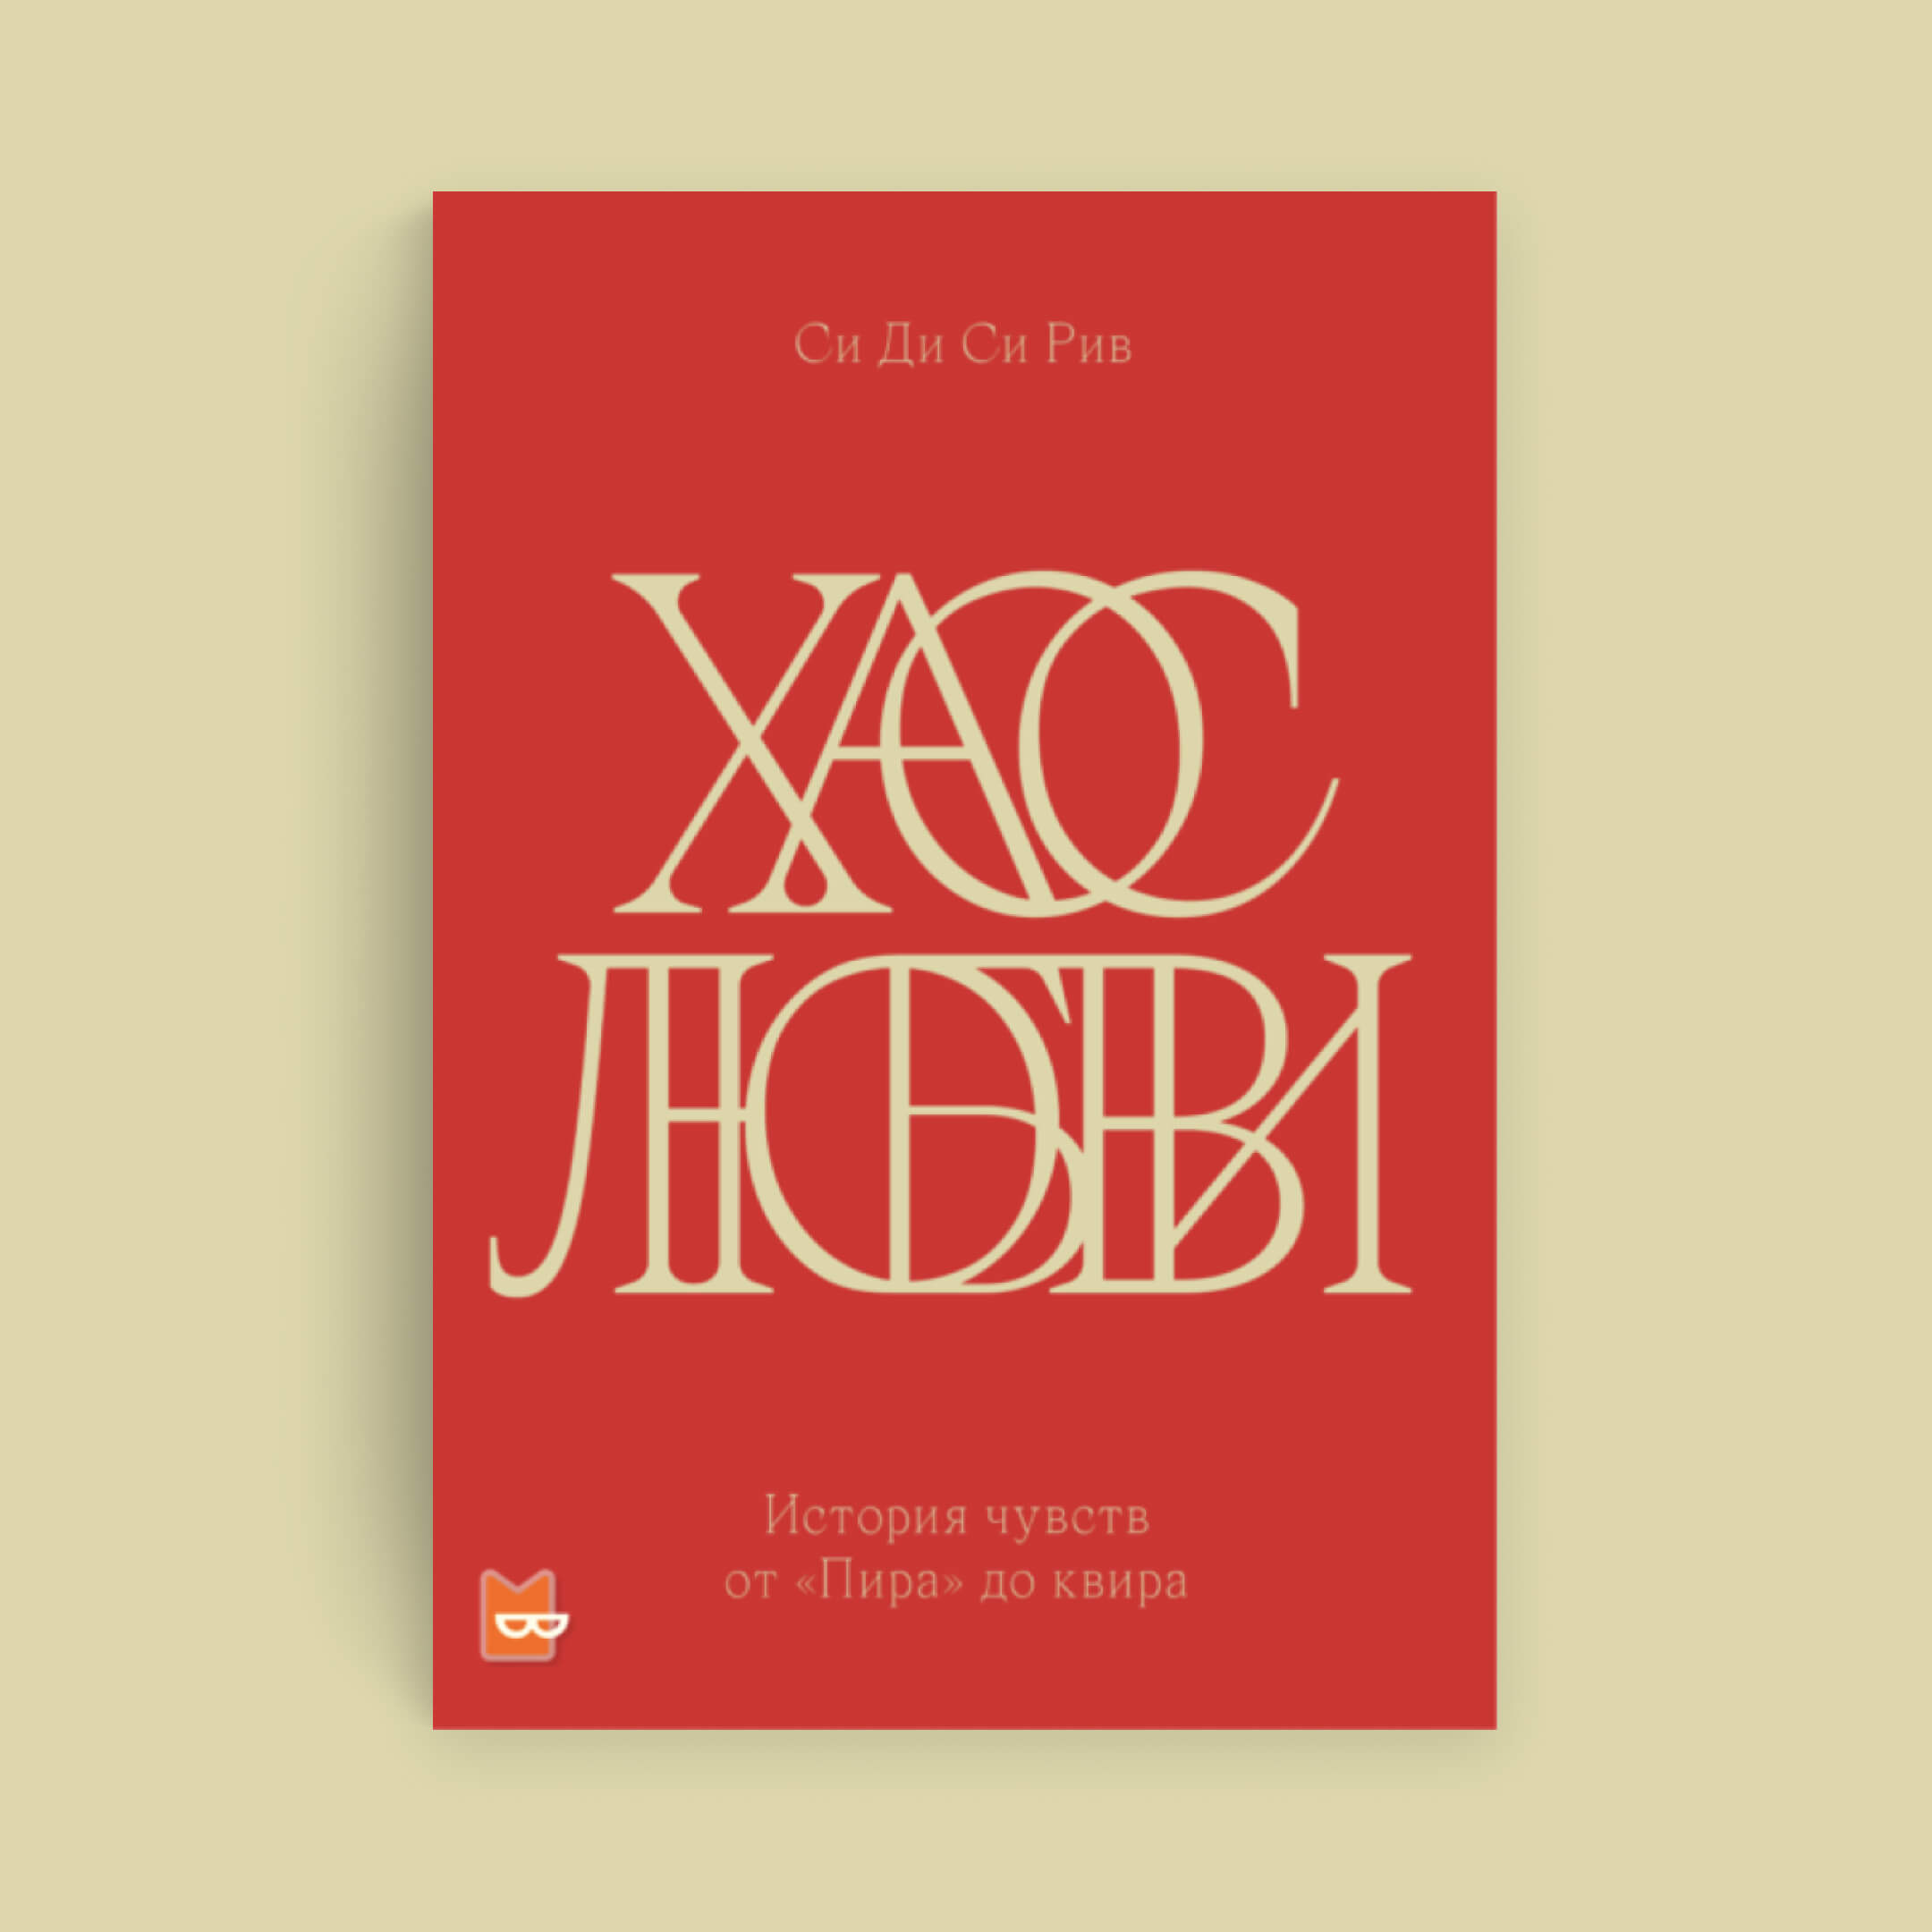 Обложка книги СиДиСиРива «Хаос любви»